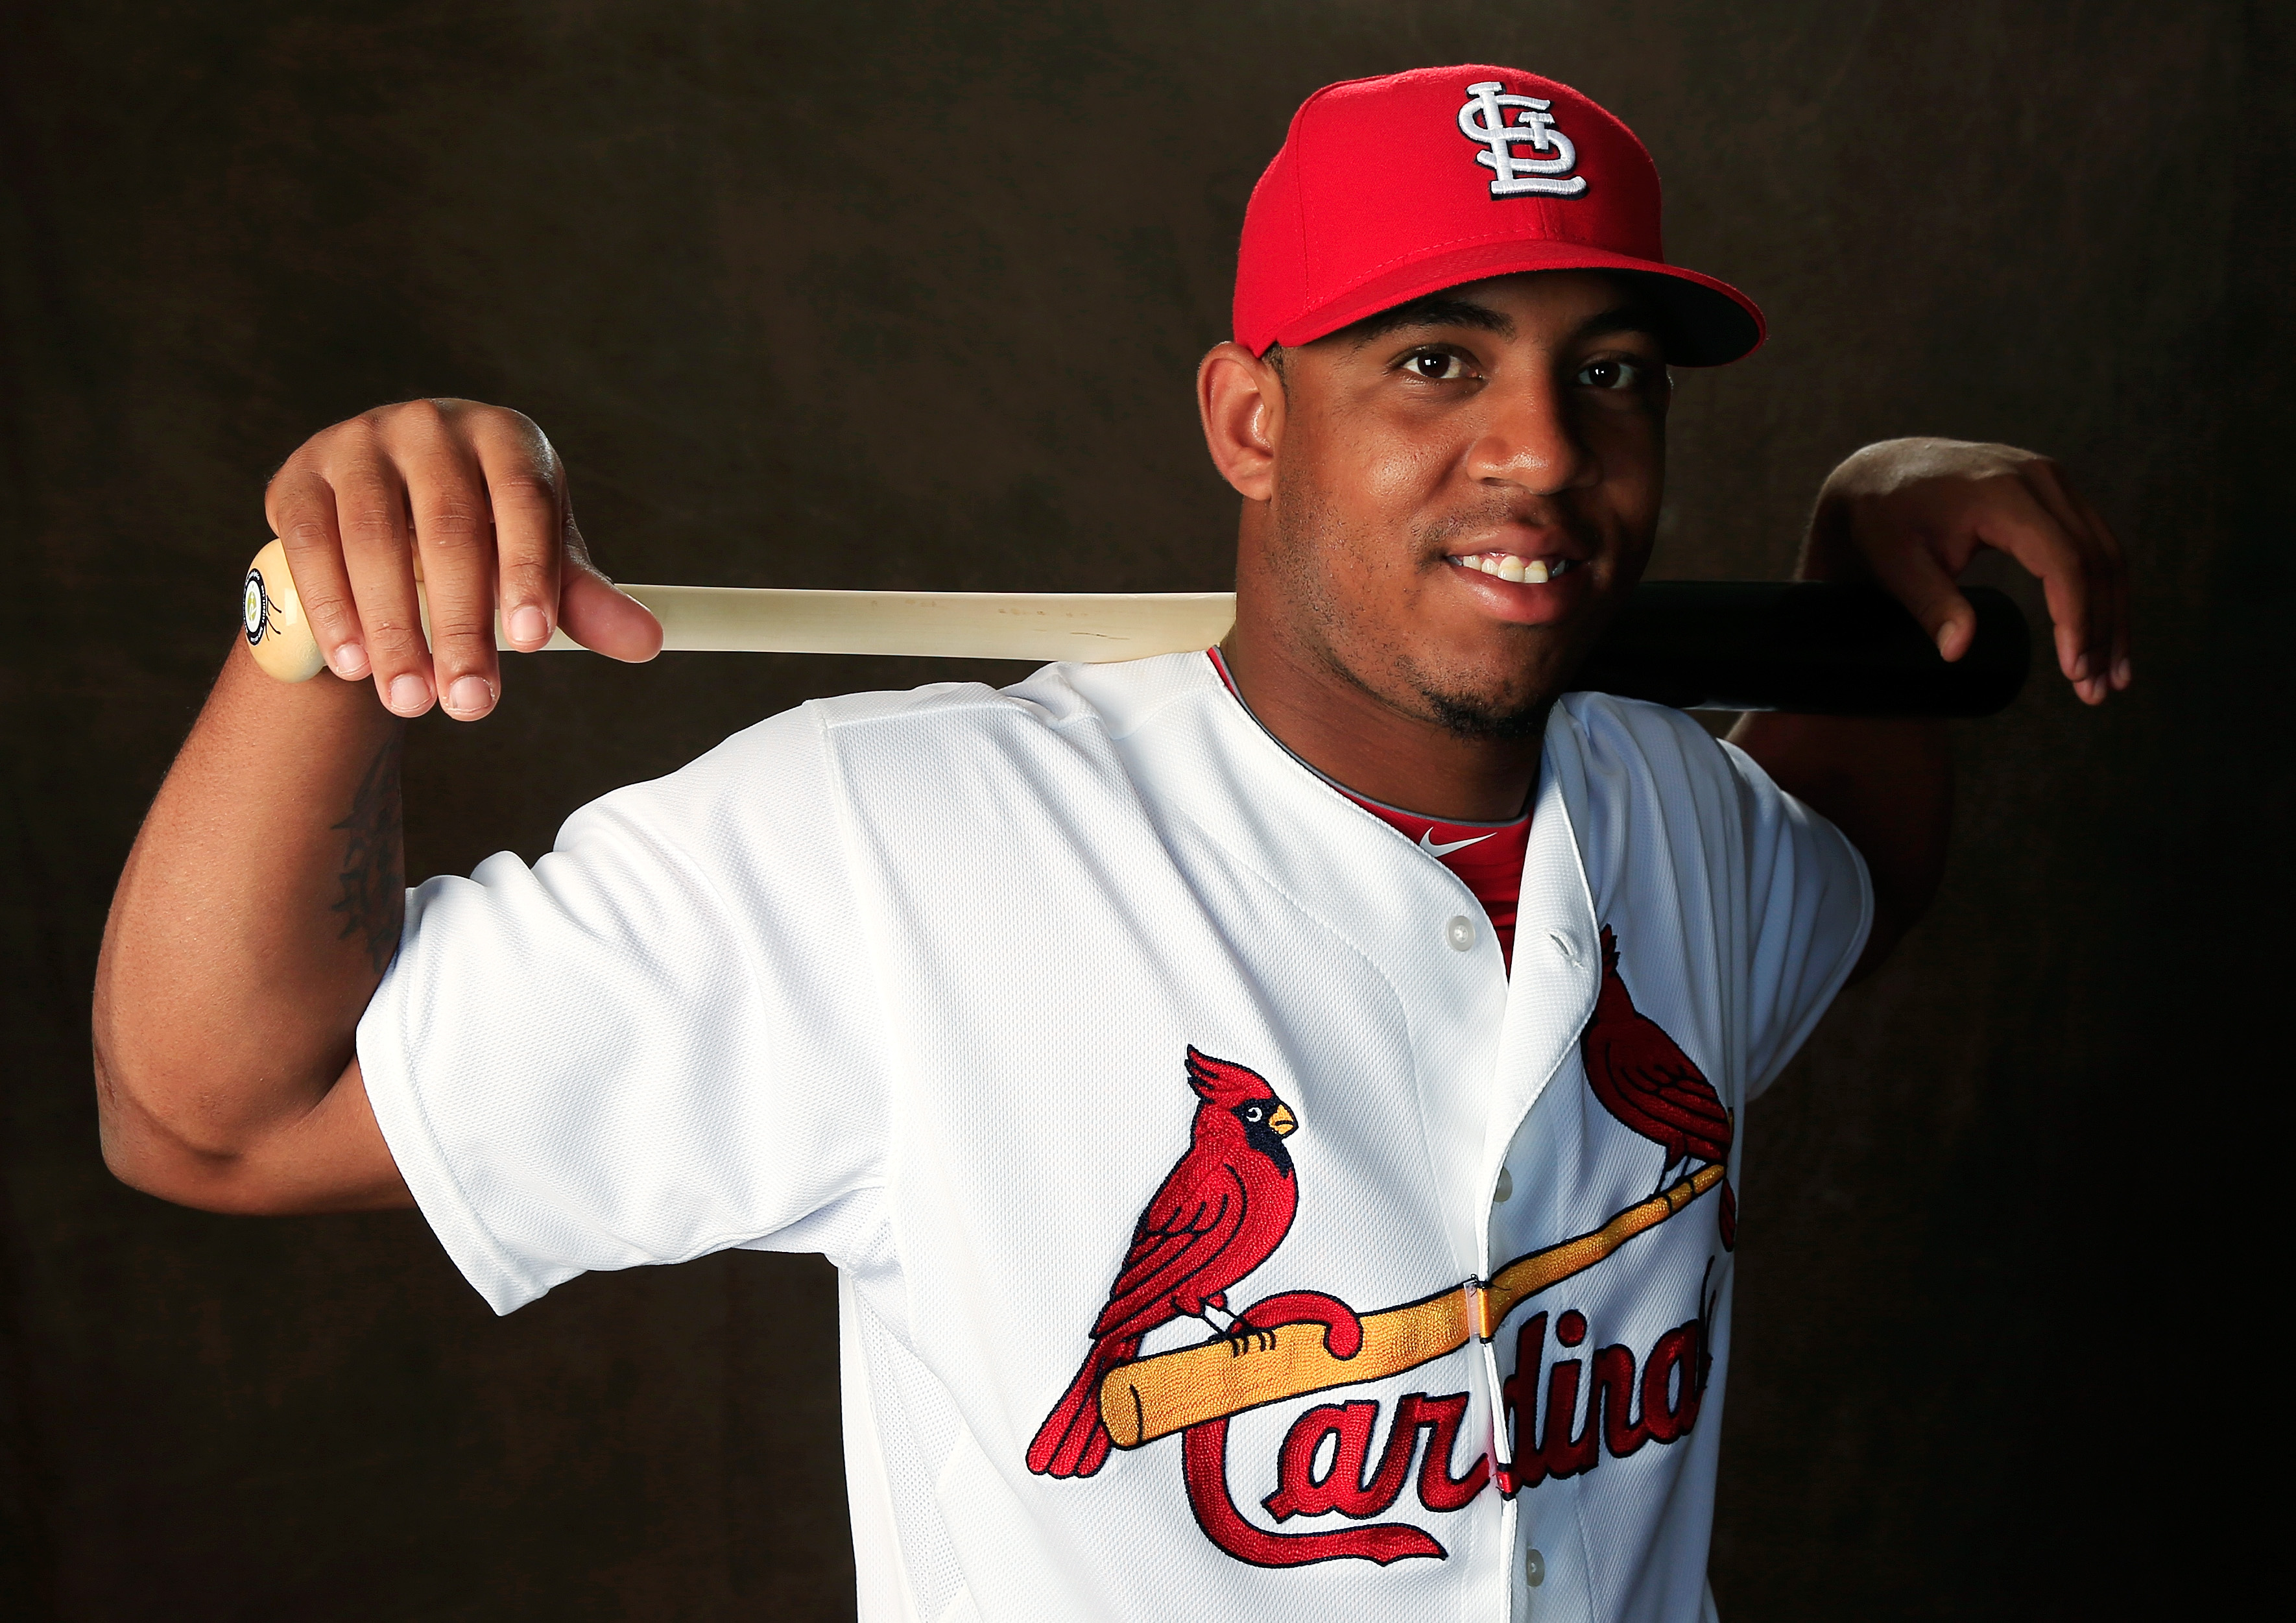 Former Cardinals outfielder Oscar Taveras